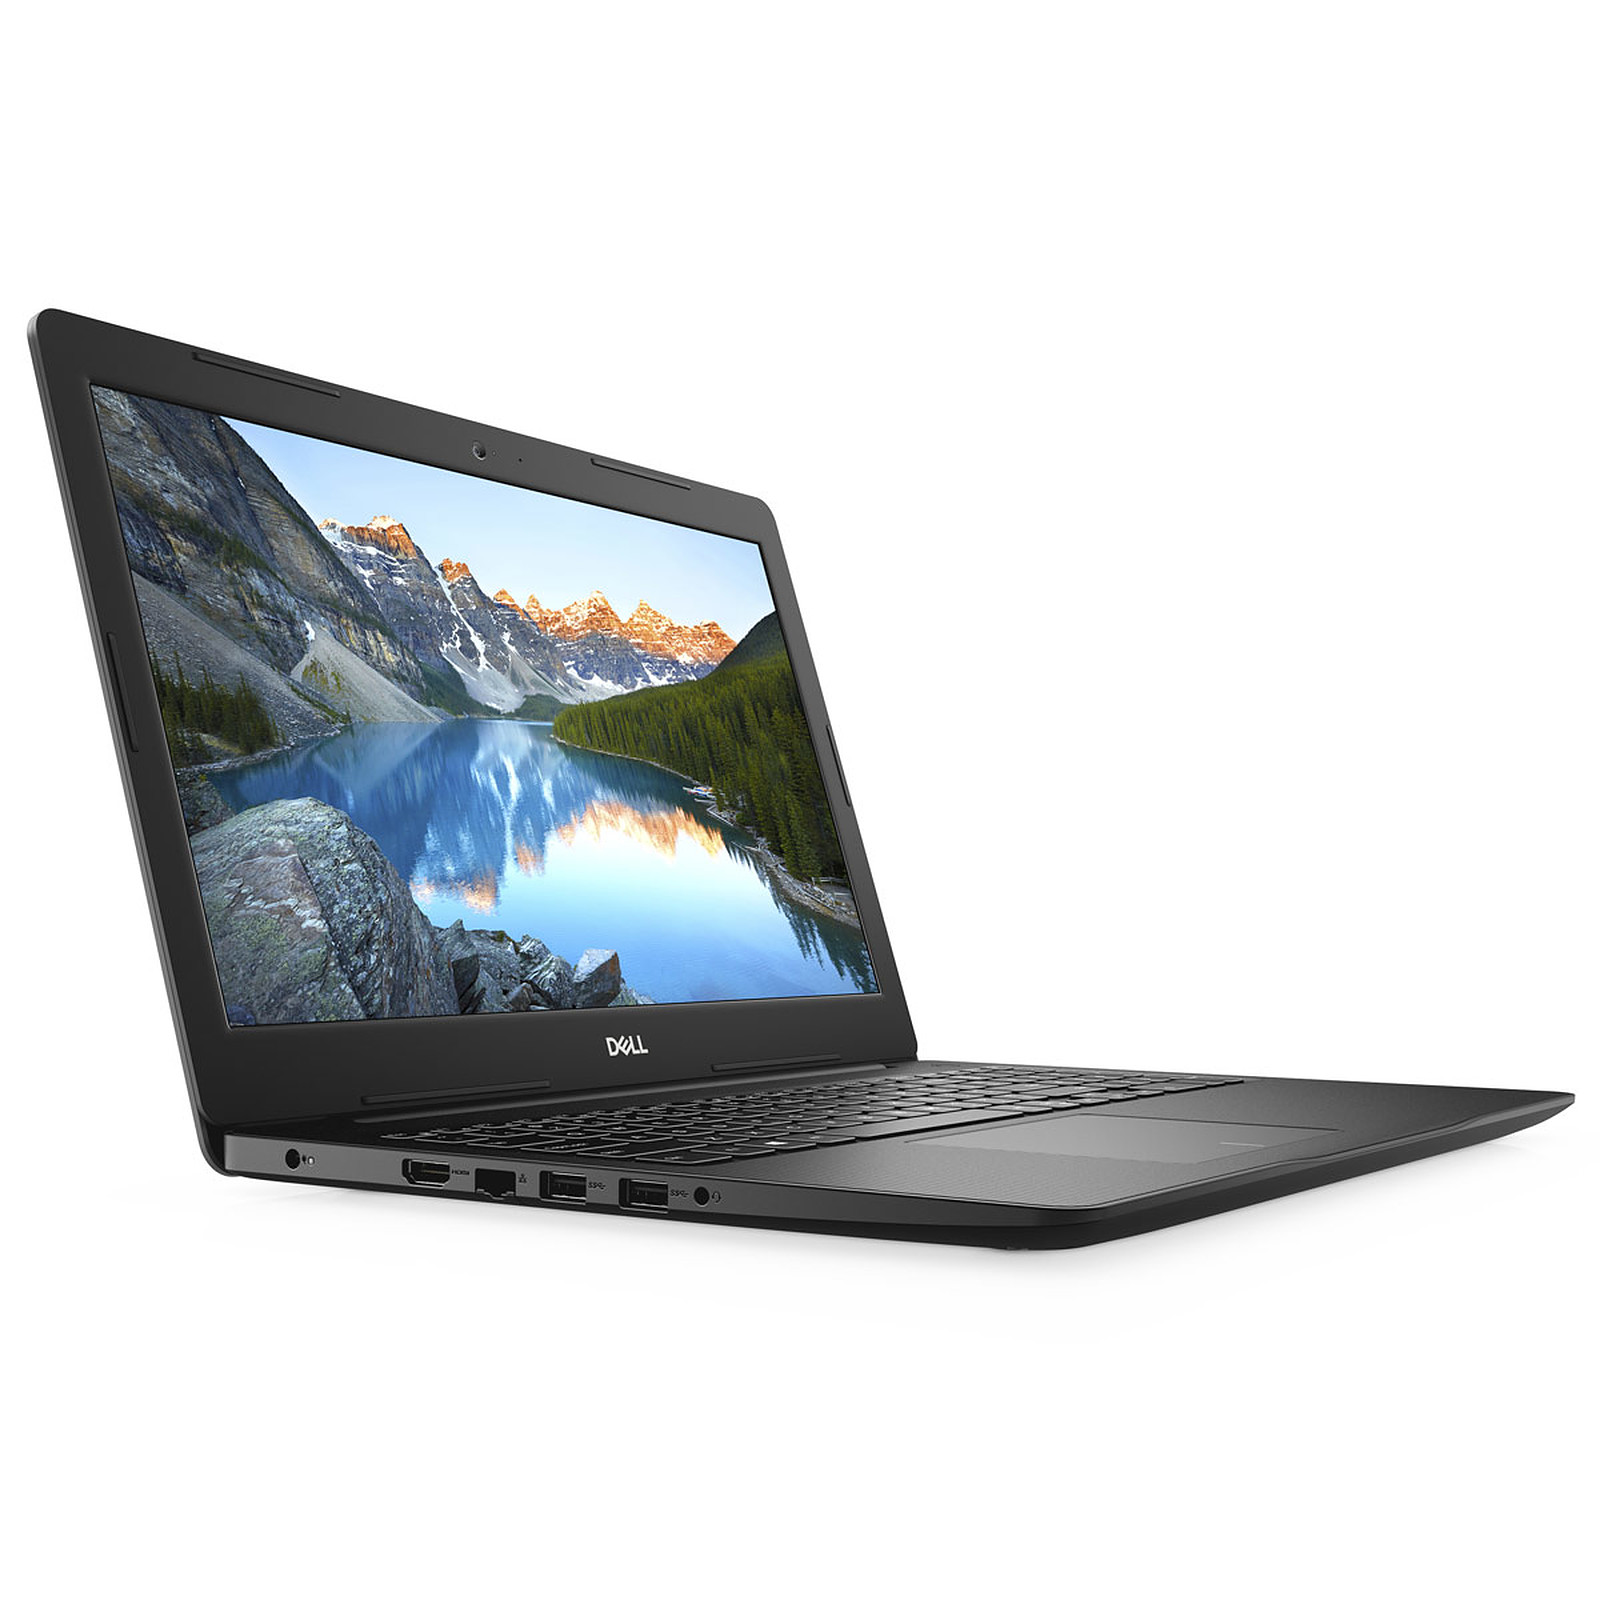 Dell Inspiron 15 3583 (D86CT)